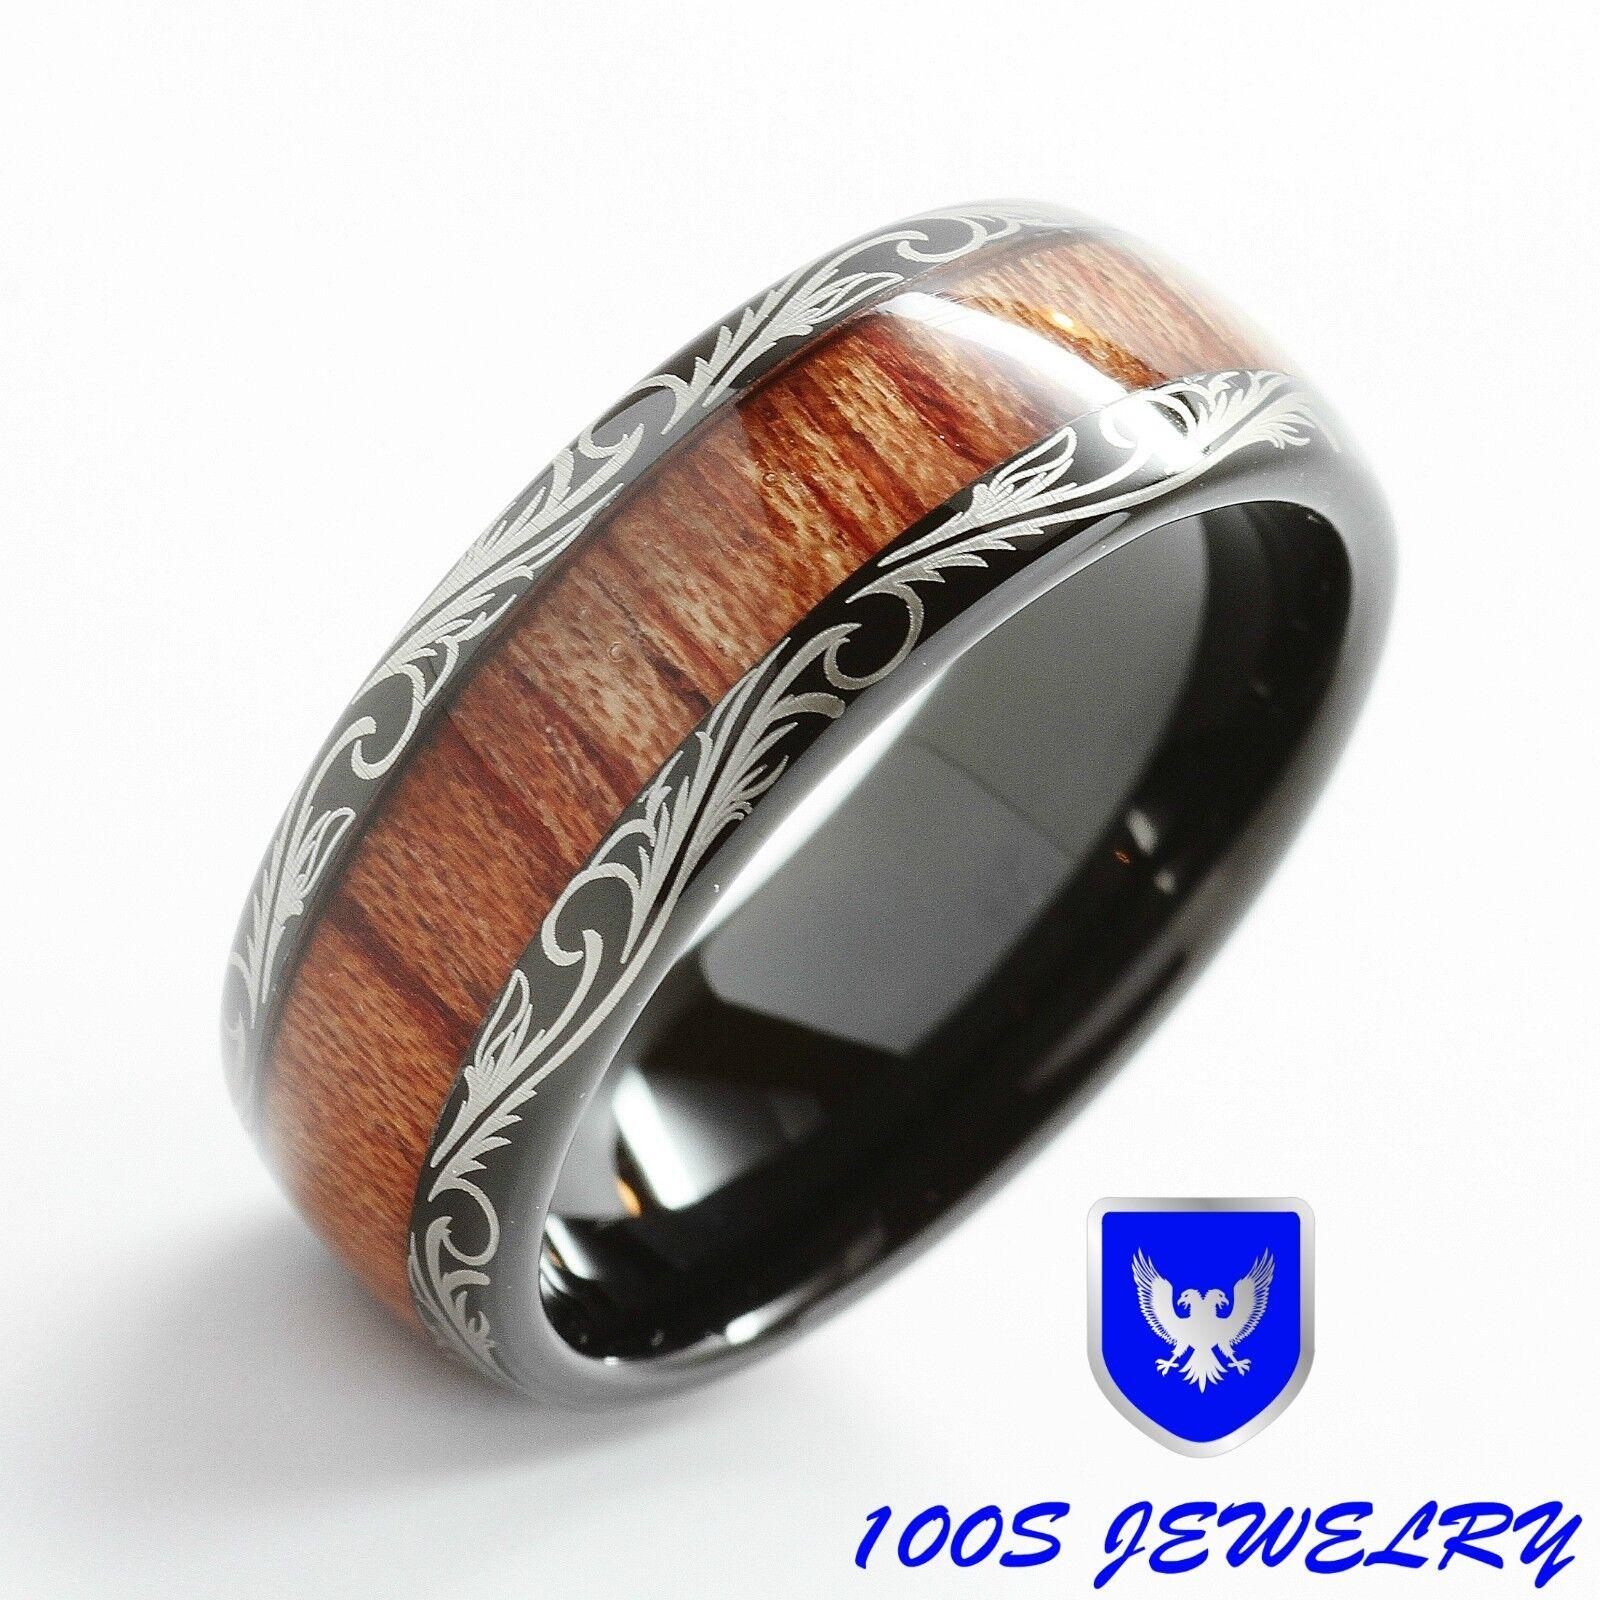 wood mens wedding bands Mens Women Wedding Band Black Tungsten Ring Koa Wood Inlay Comfort Fit Size 6 16